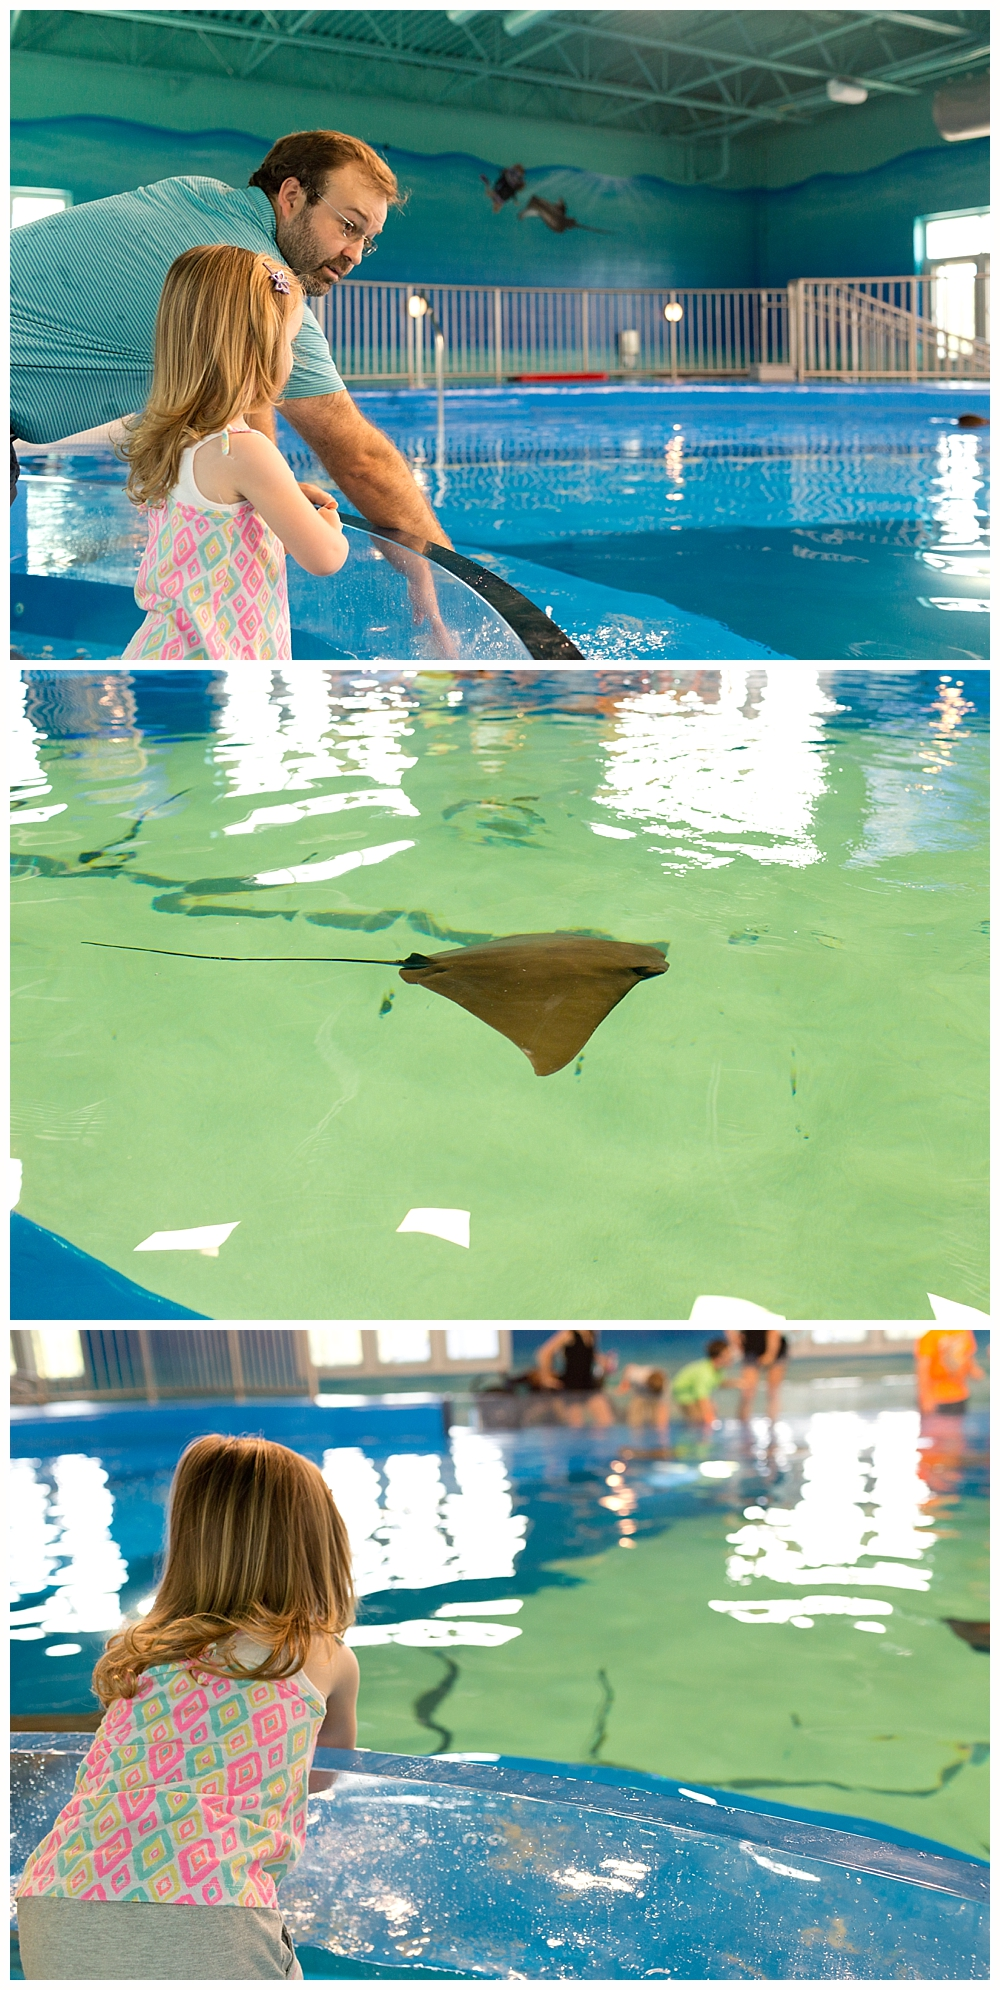 ray pool at Ocean Adventures Marine Park